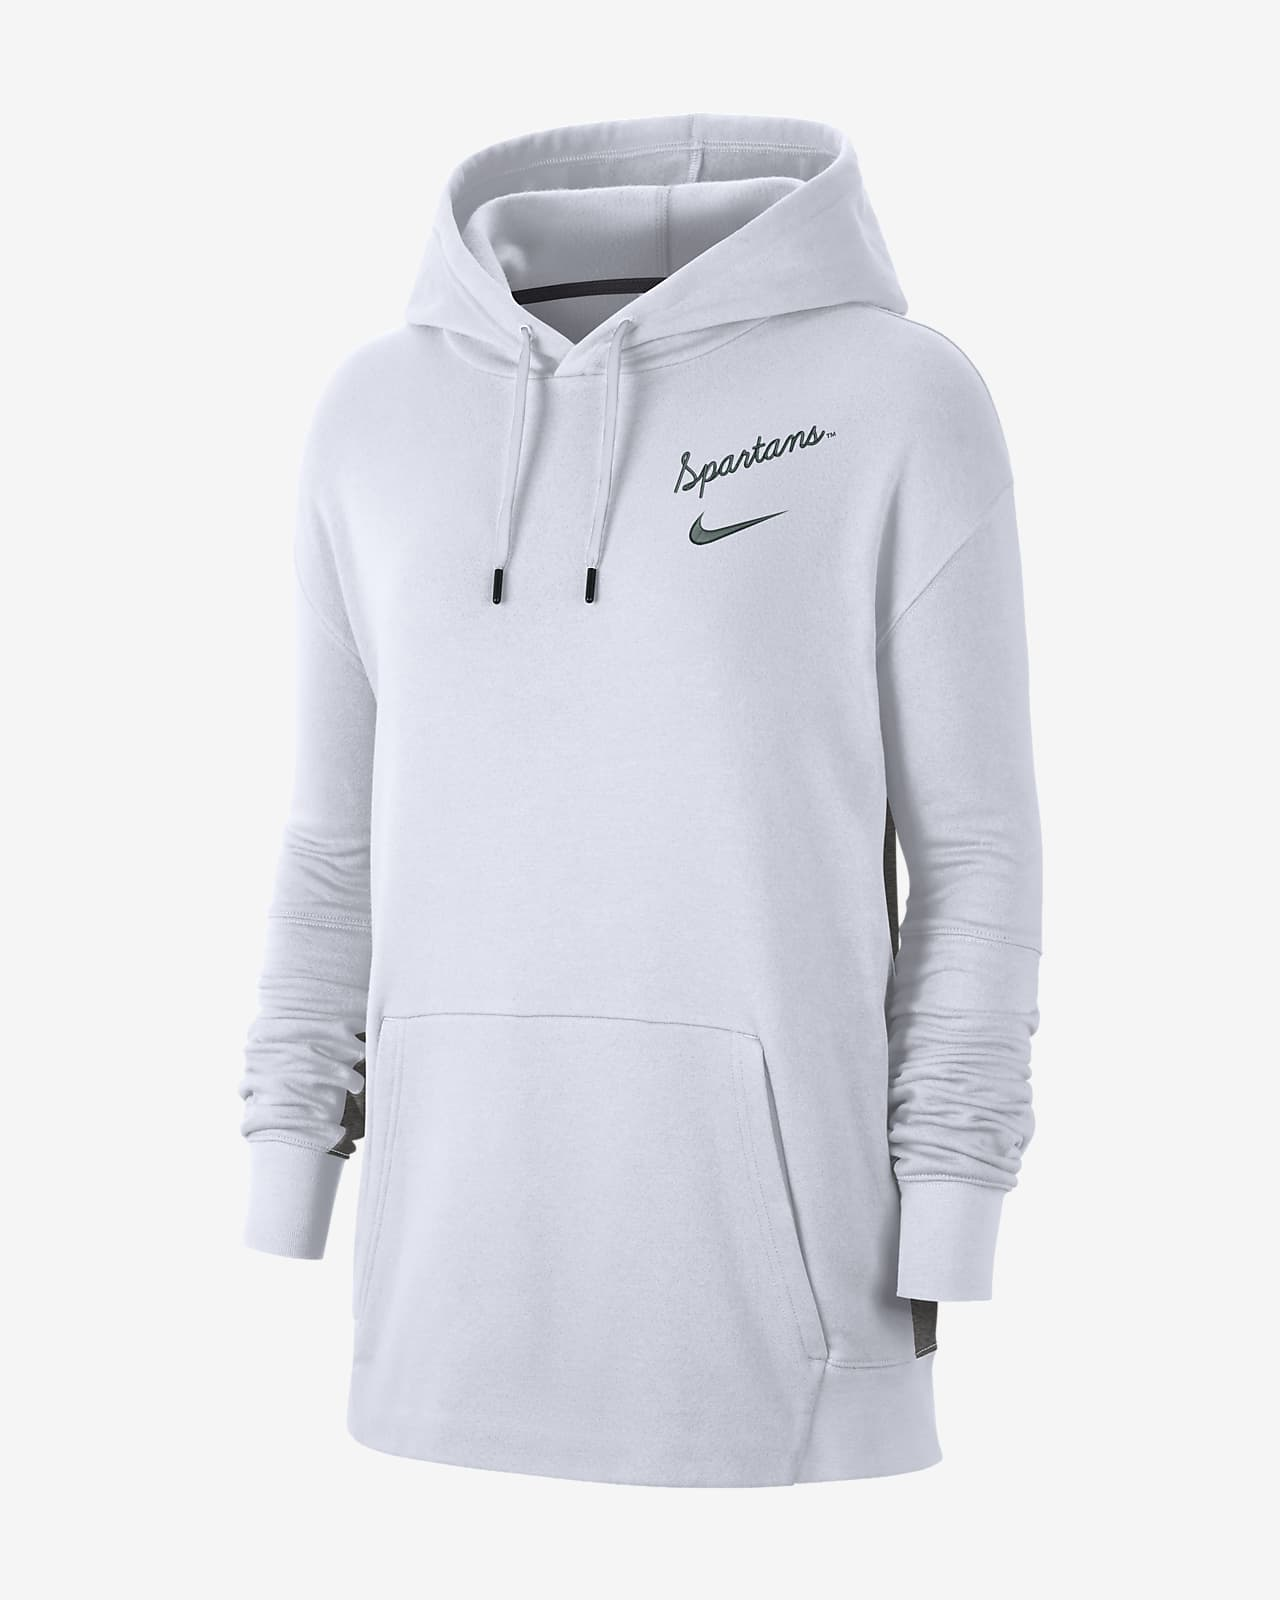 Nike College (Michigan State) Women's Fleece Pullover Hoodie